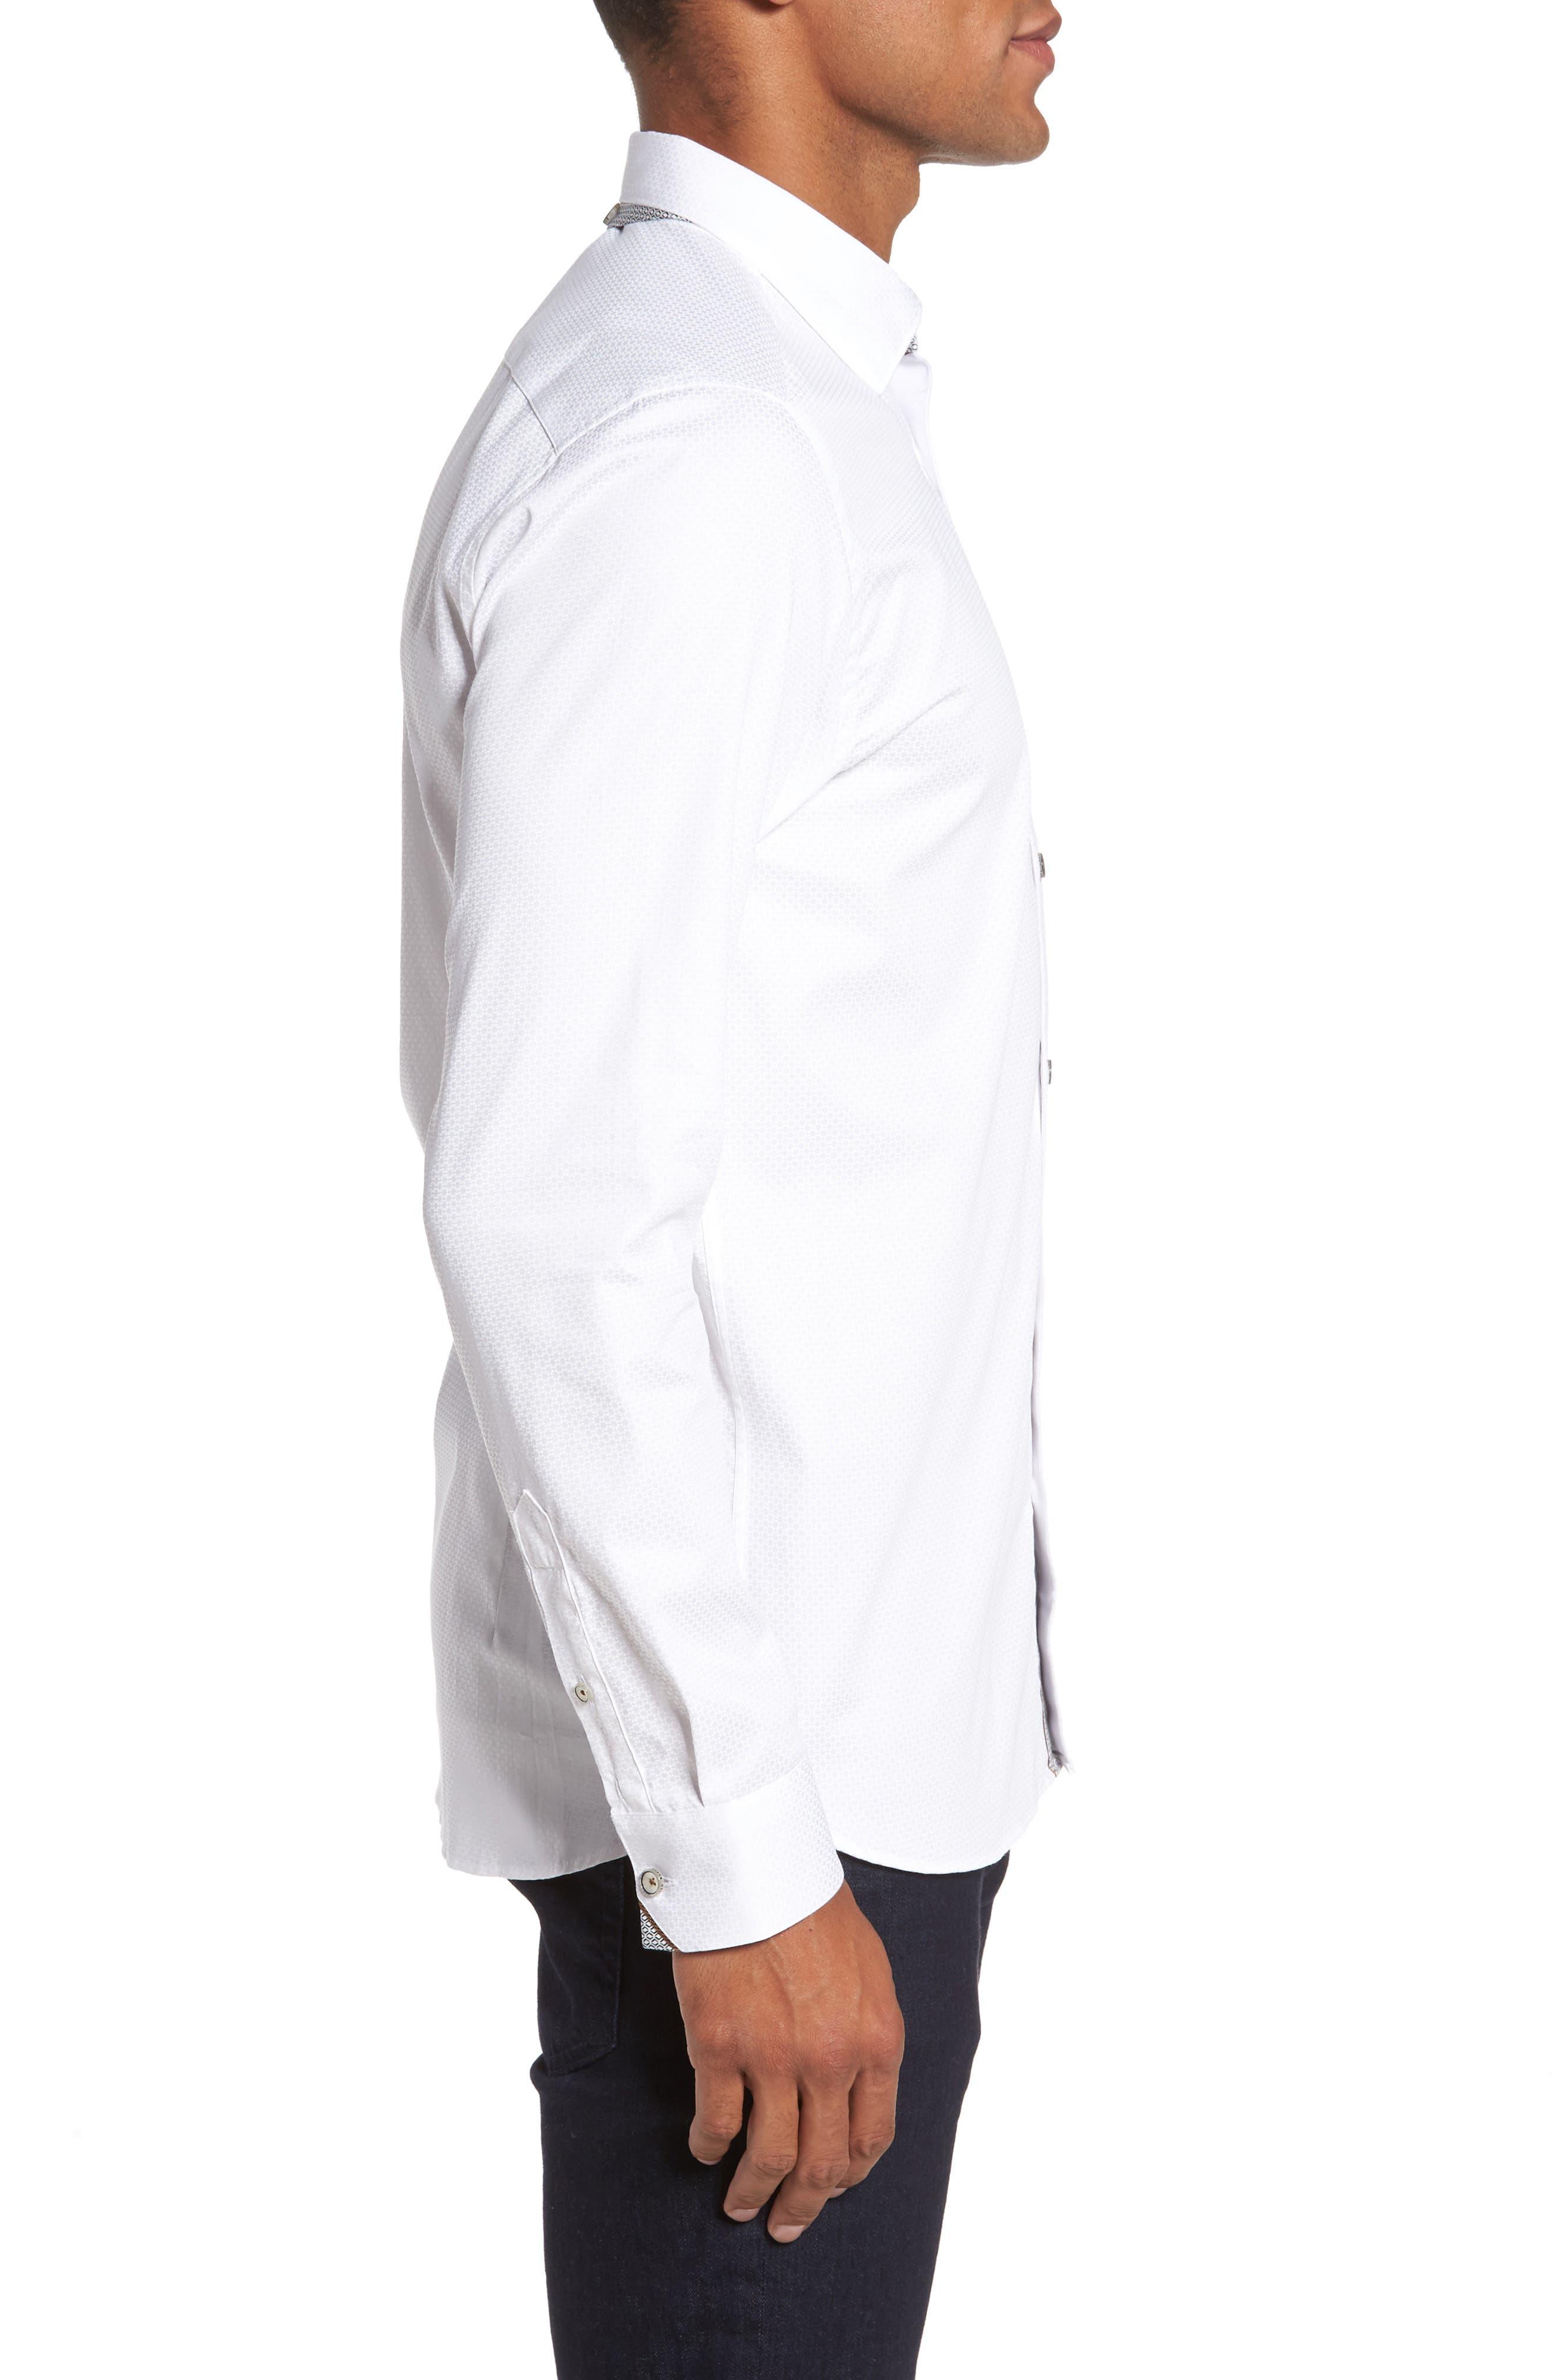 Strazbo Tonal Print Sport Shirt,                             Alternate thumbnail 3, color,                             White